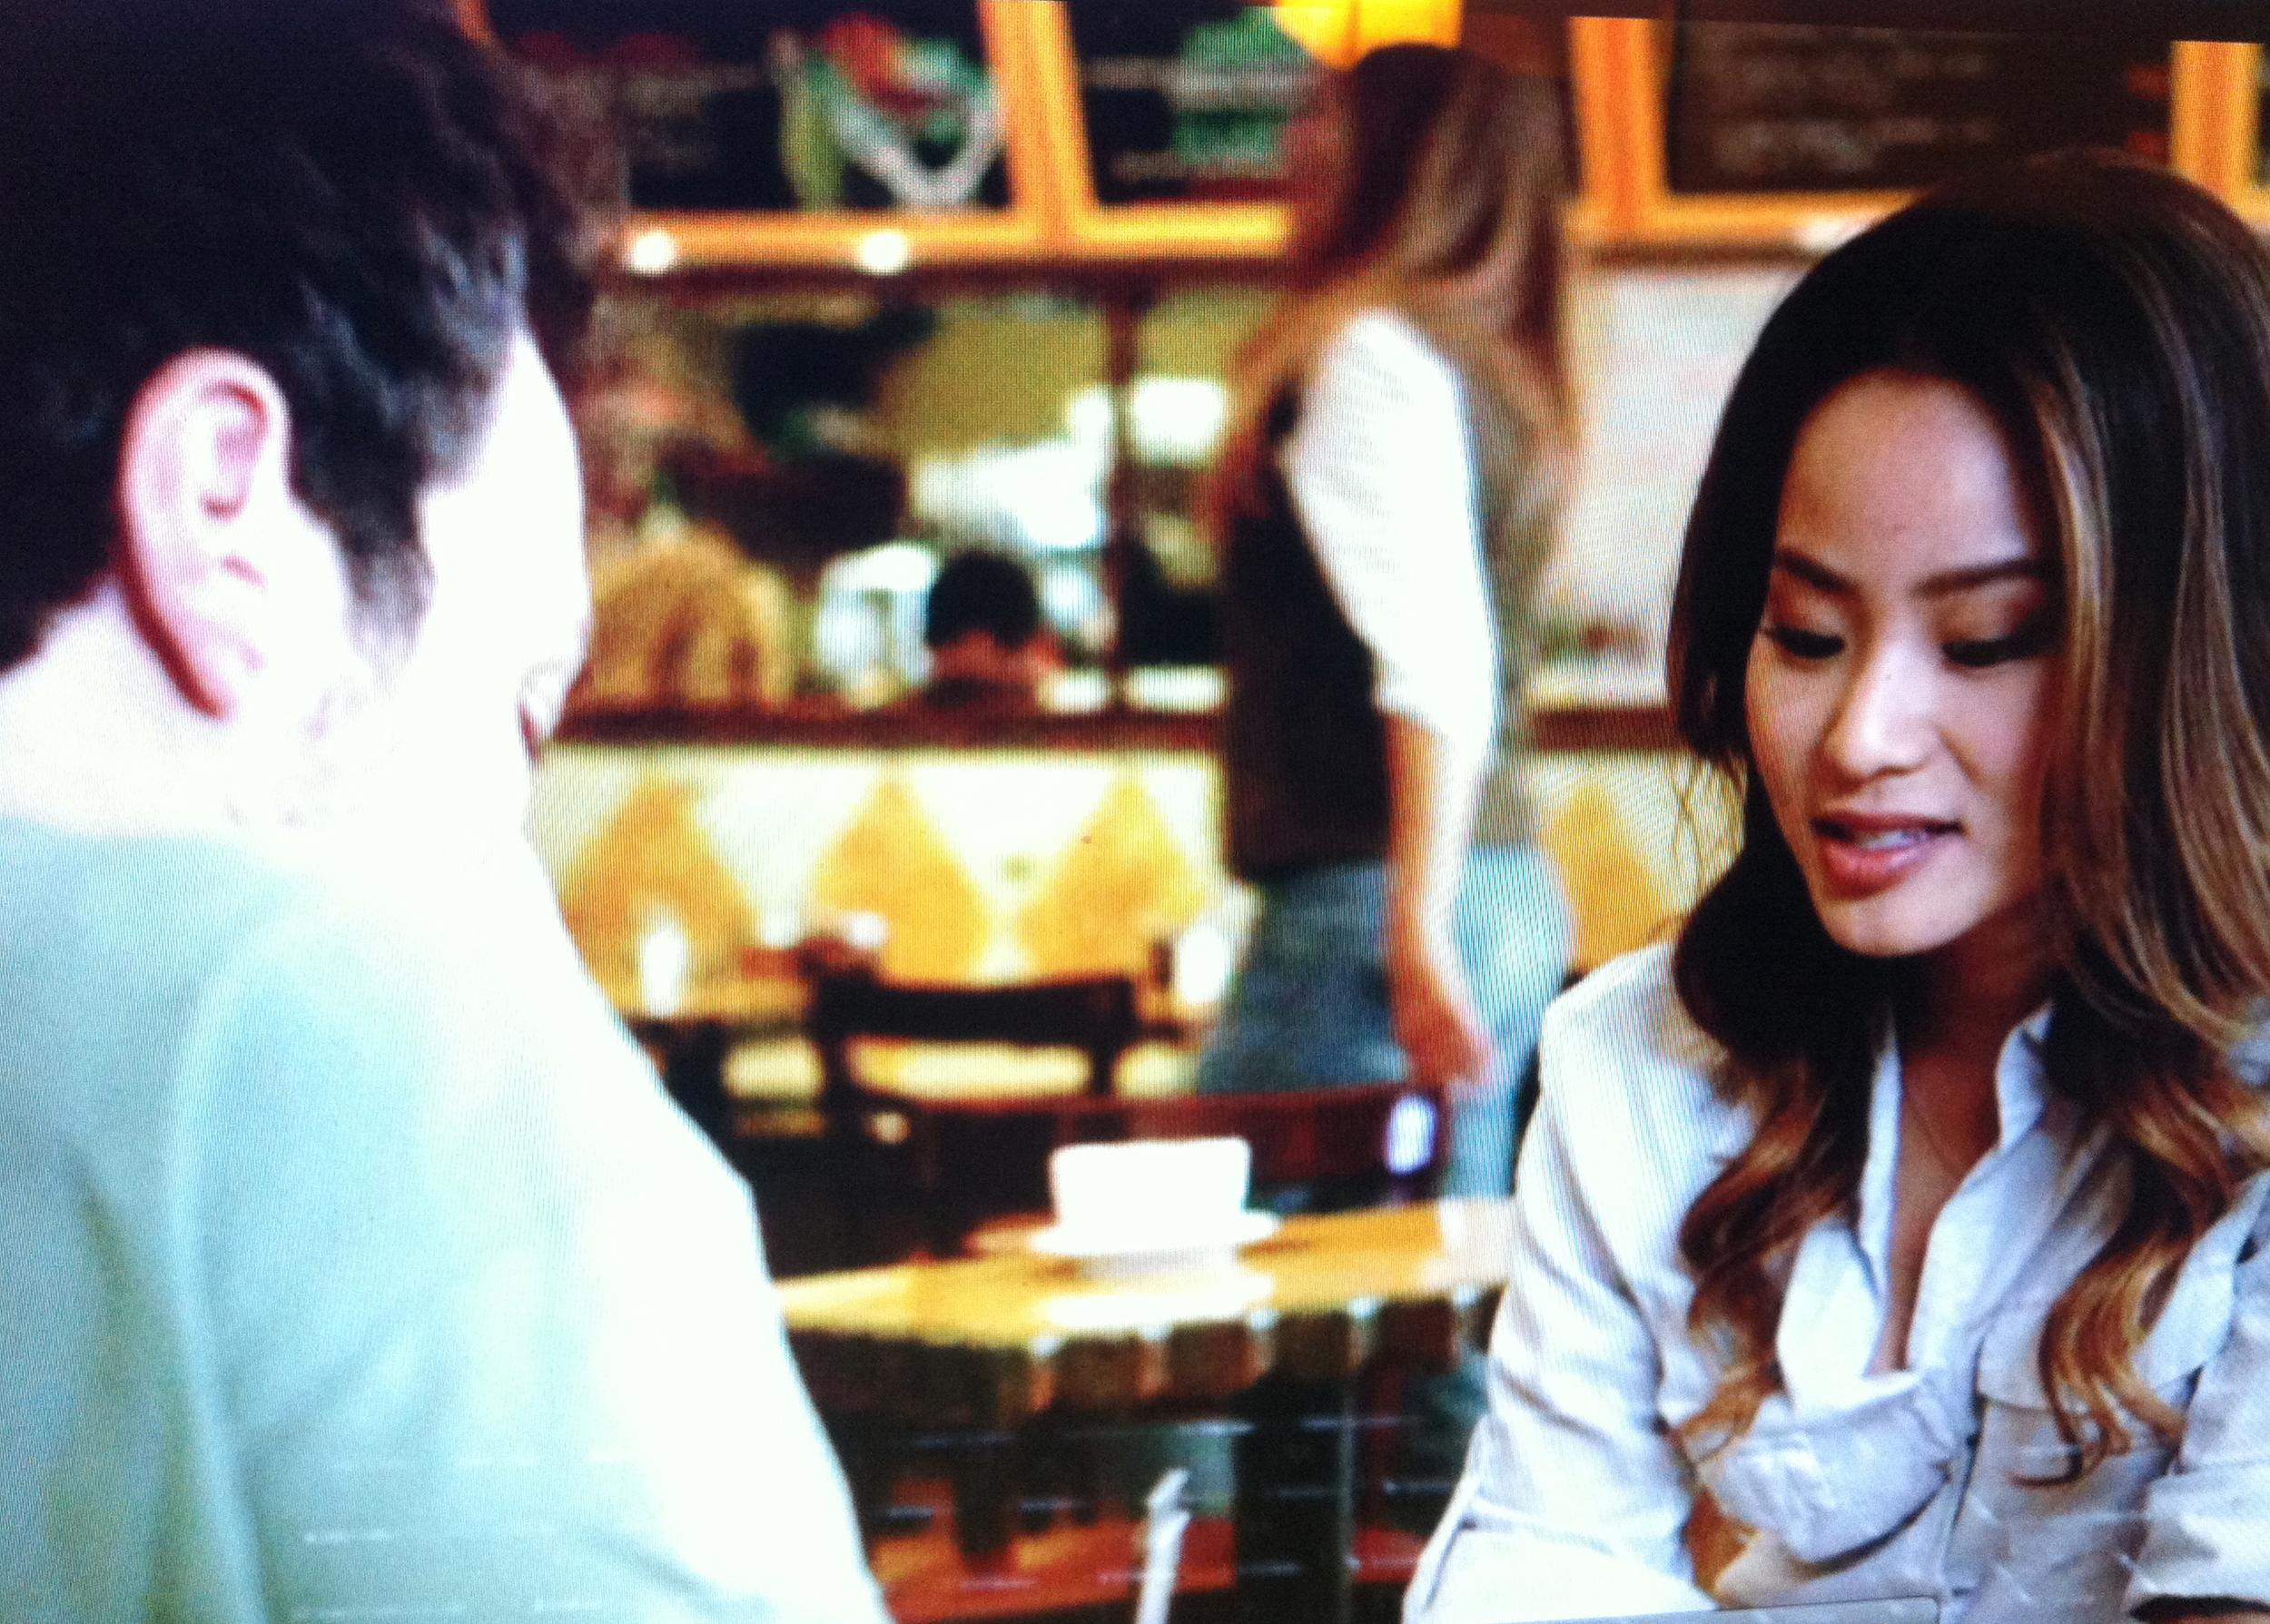 With Jamie Chung